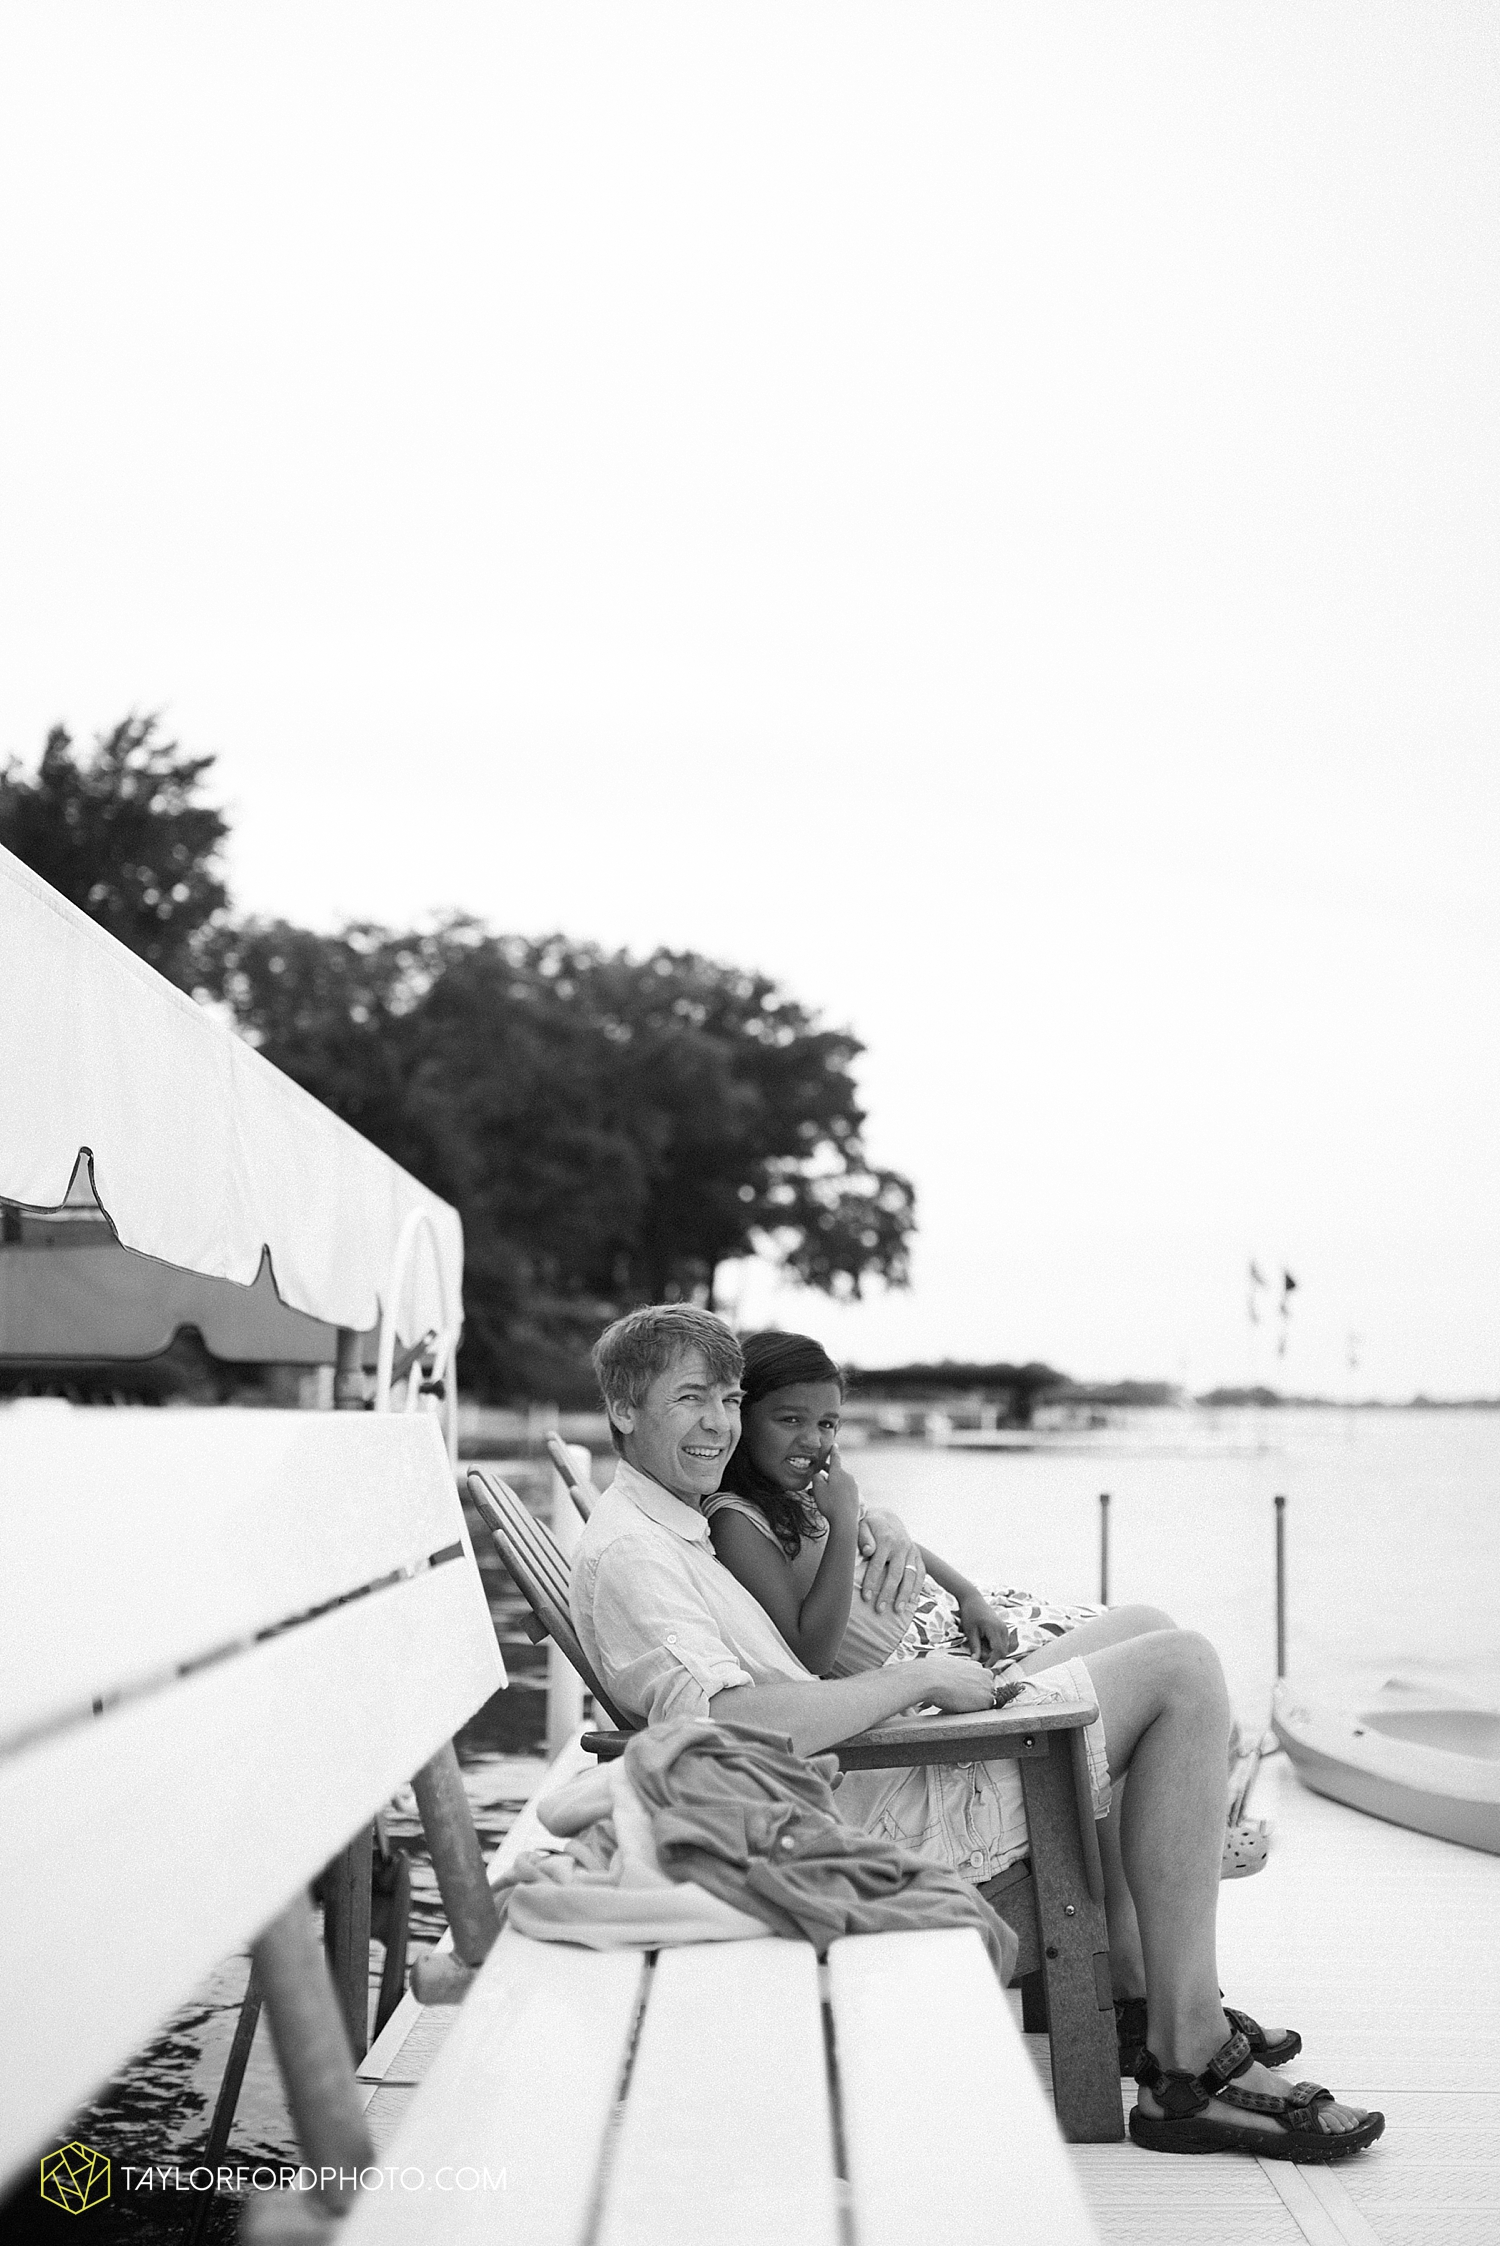 syracuse_indiana_lake_wawasee_family_photographer_taylor_ford_wedding_1904.jpg